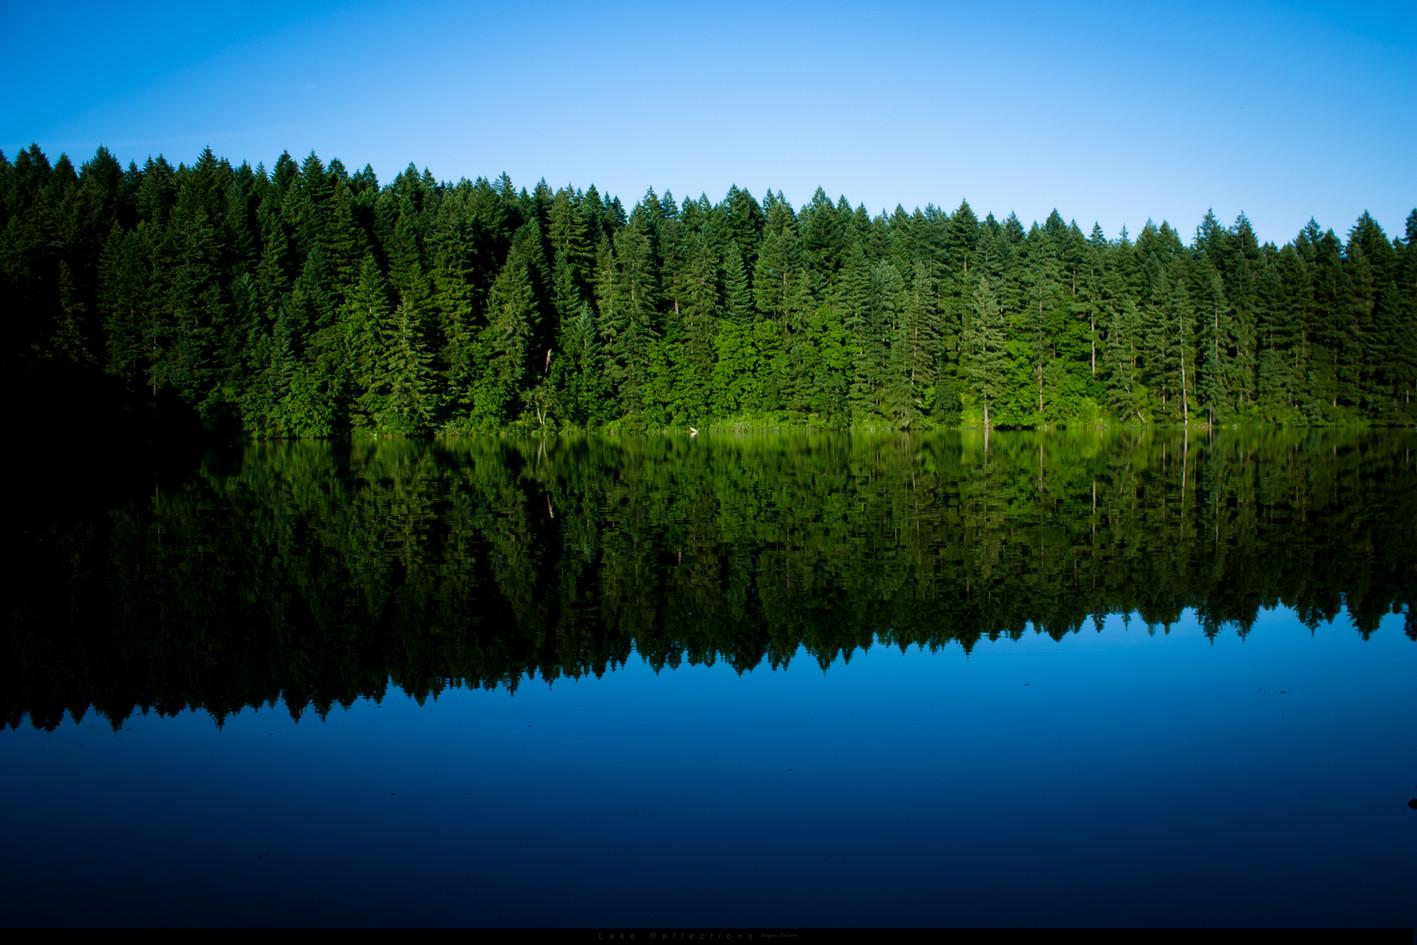 Lake-reflections-3.jpg